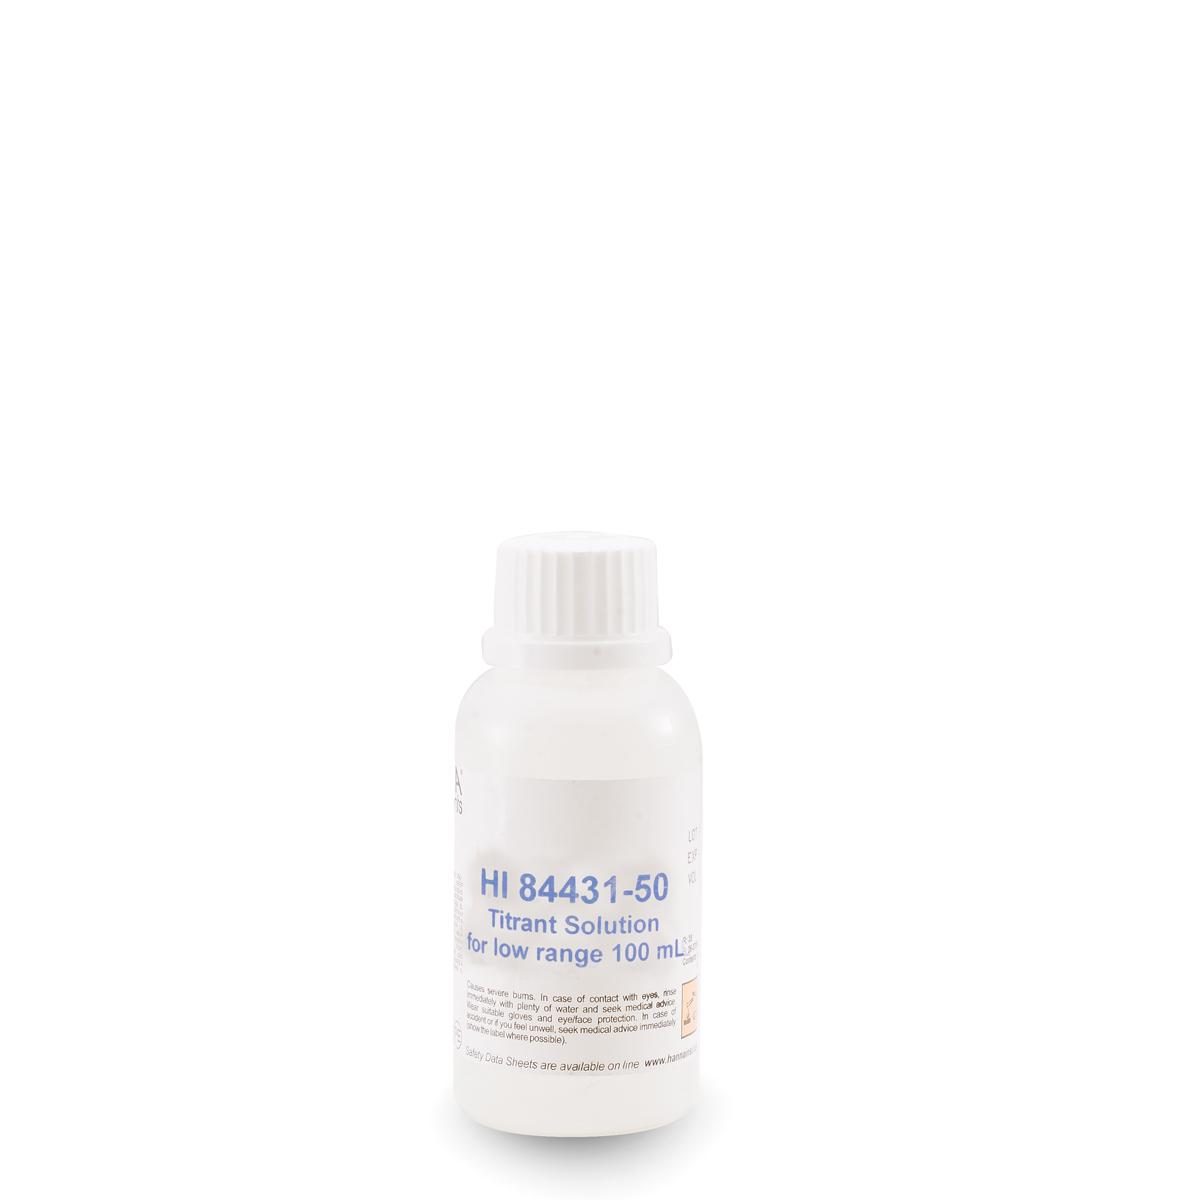 Low Range Titrant for Titratable Alkalinity in Water Mini Titrator - HI84431-50